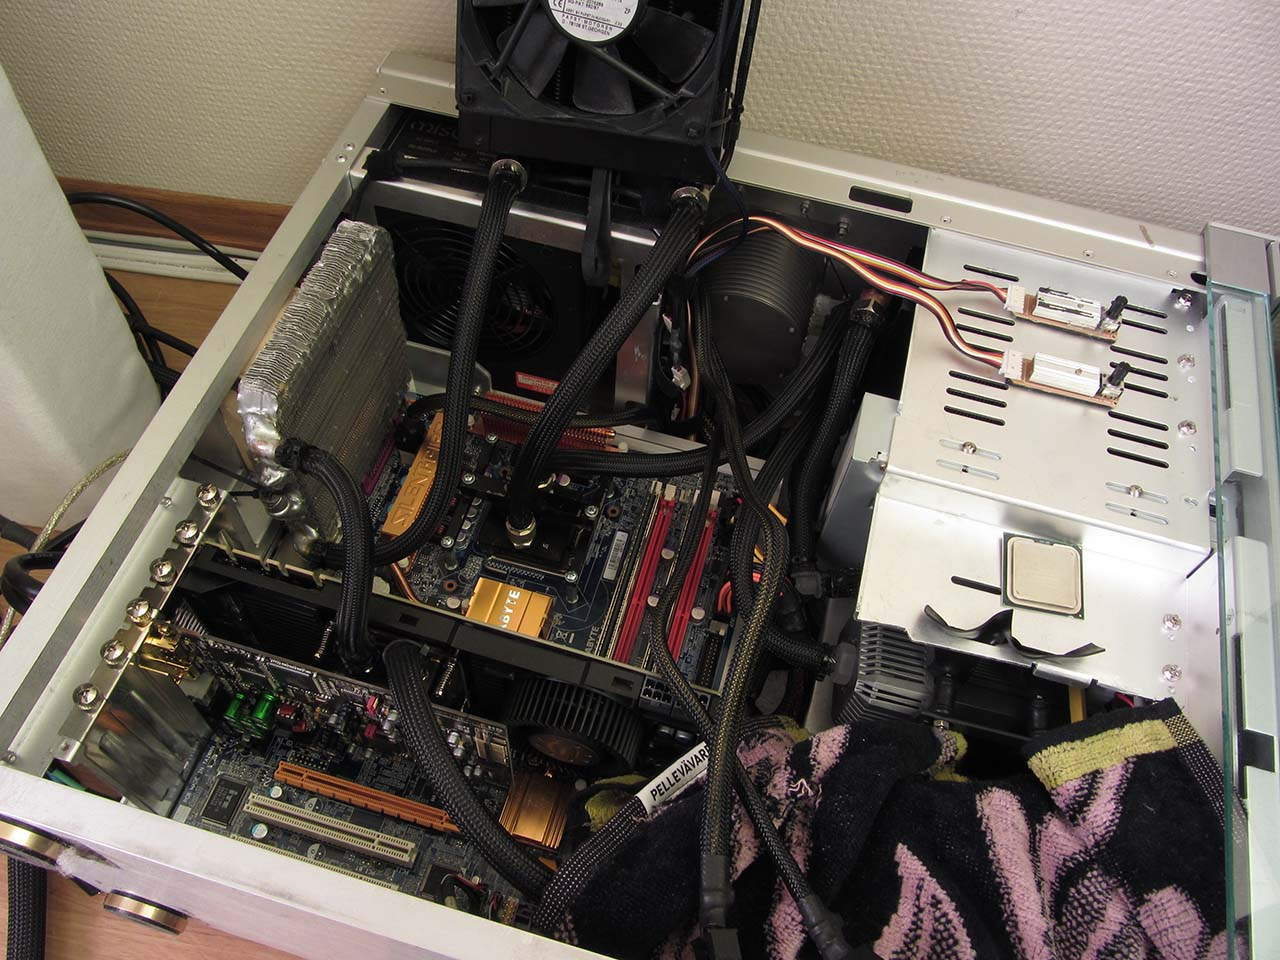 Q6700 GTX 470 motherboard